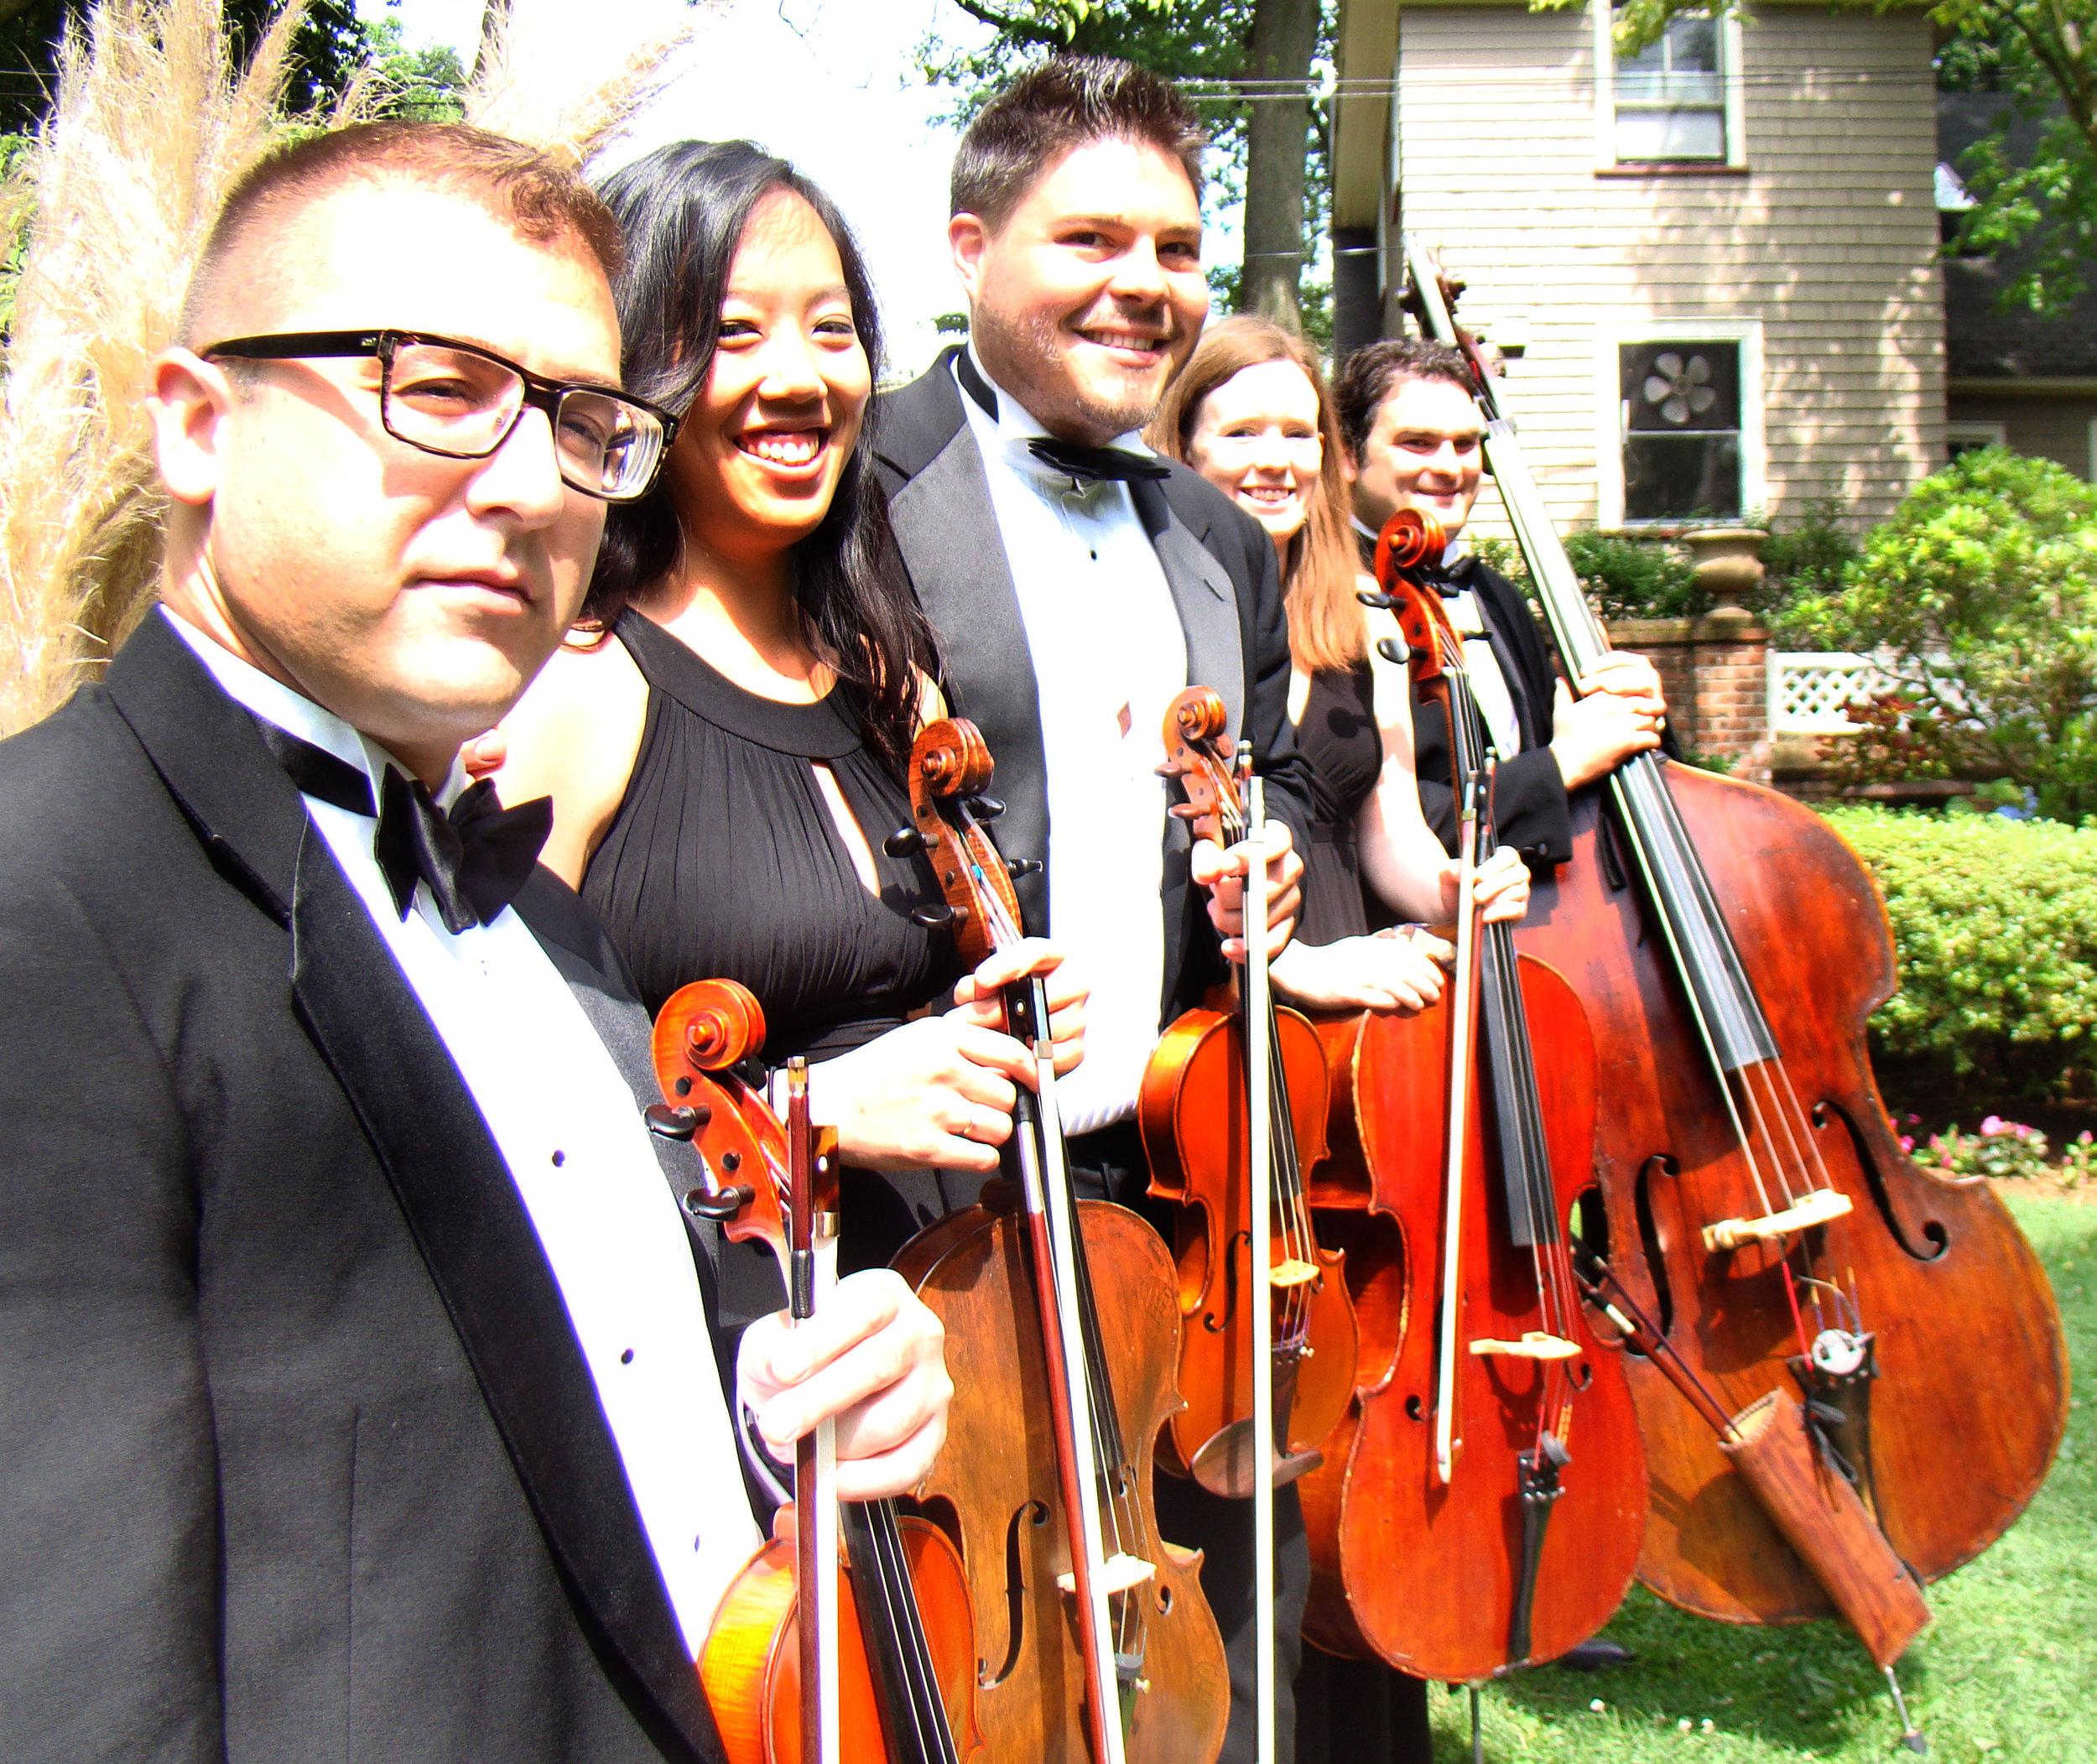 Allemande Ensembles | String Quartet Jazz Trio NJ NYC Weddings and Events